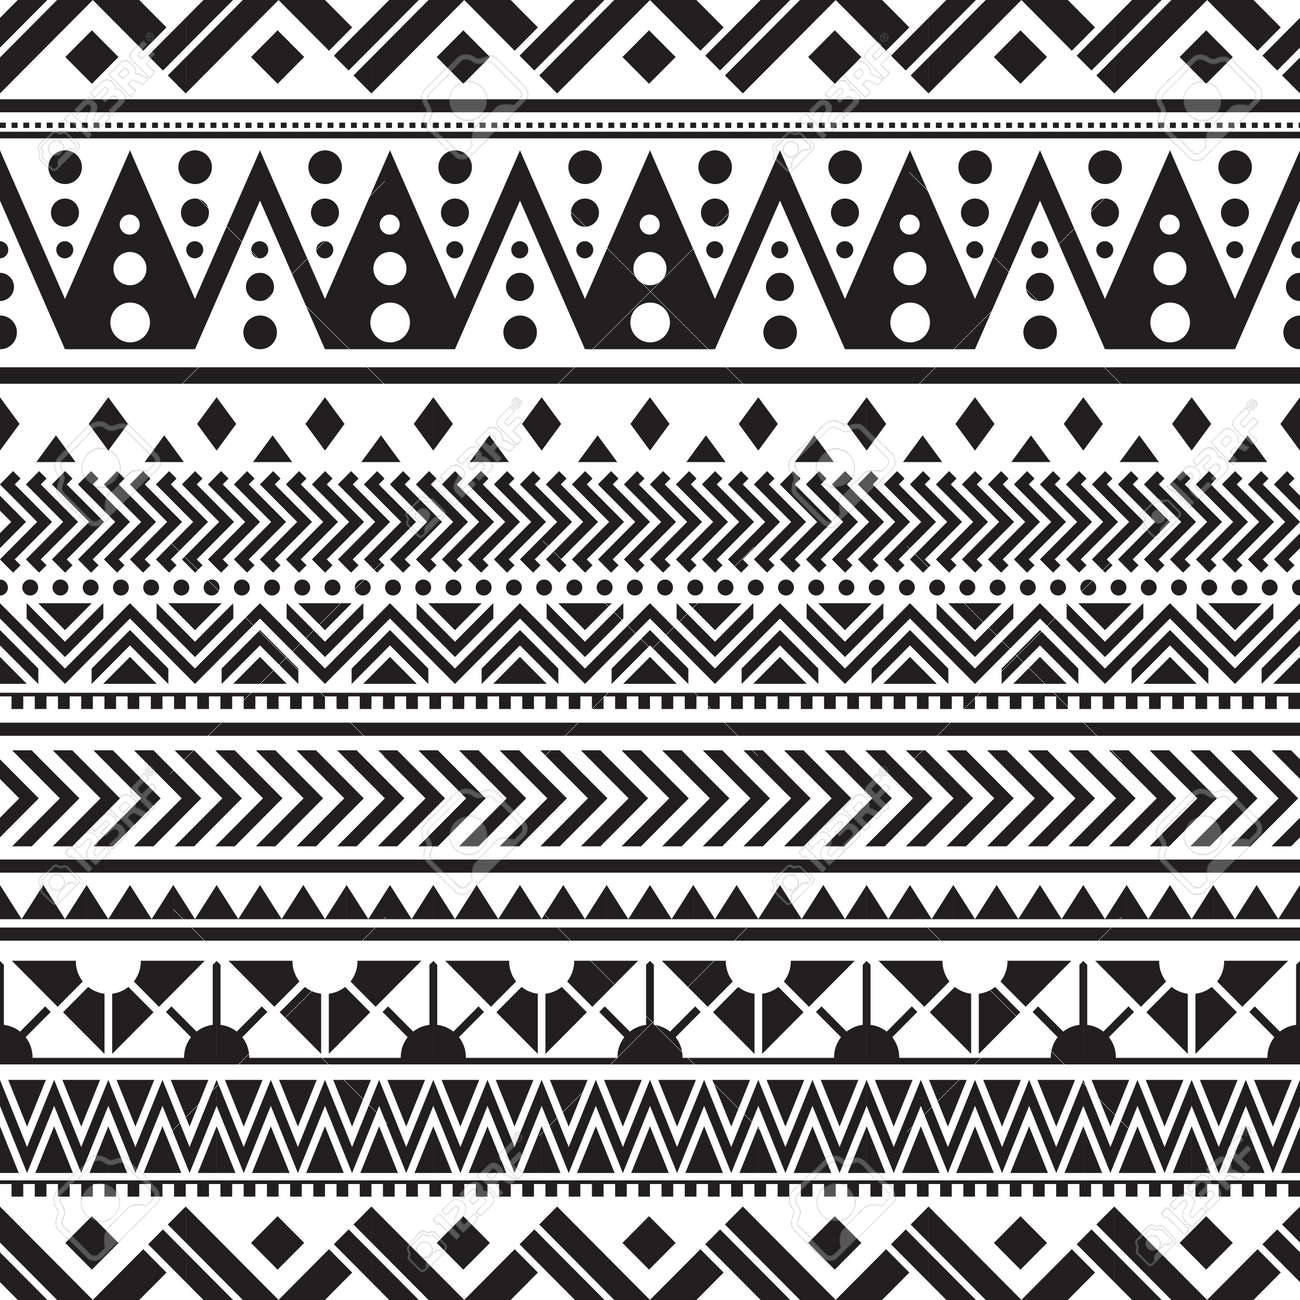 Tribal seamless pattern geometric seamless aztec pattern design - 154310430